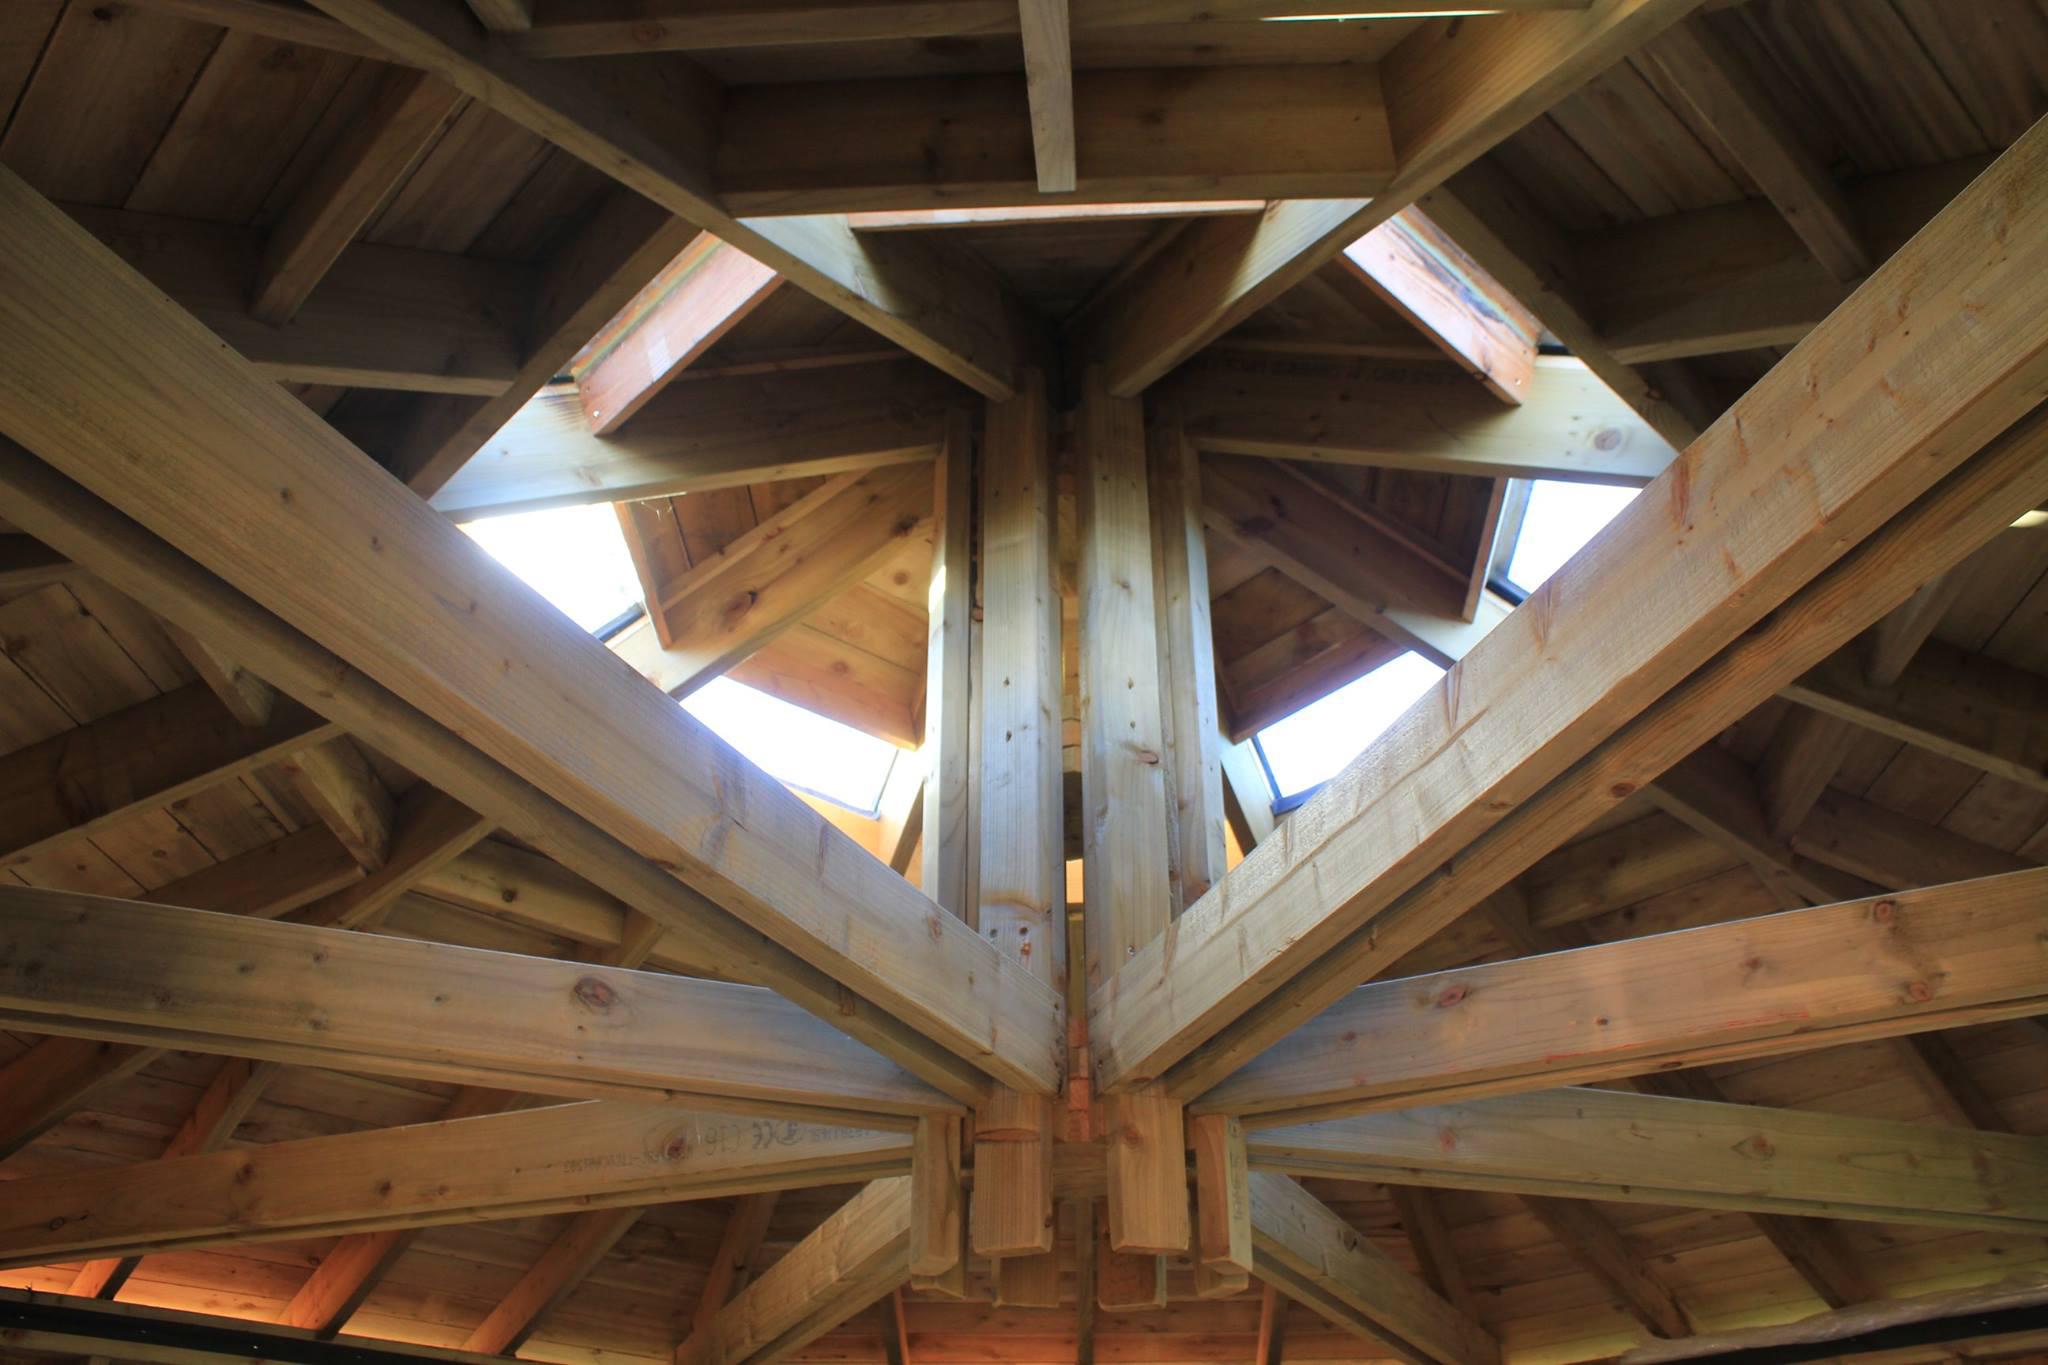 Internal Roof Detail of Octagonal Yurts